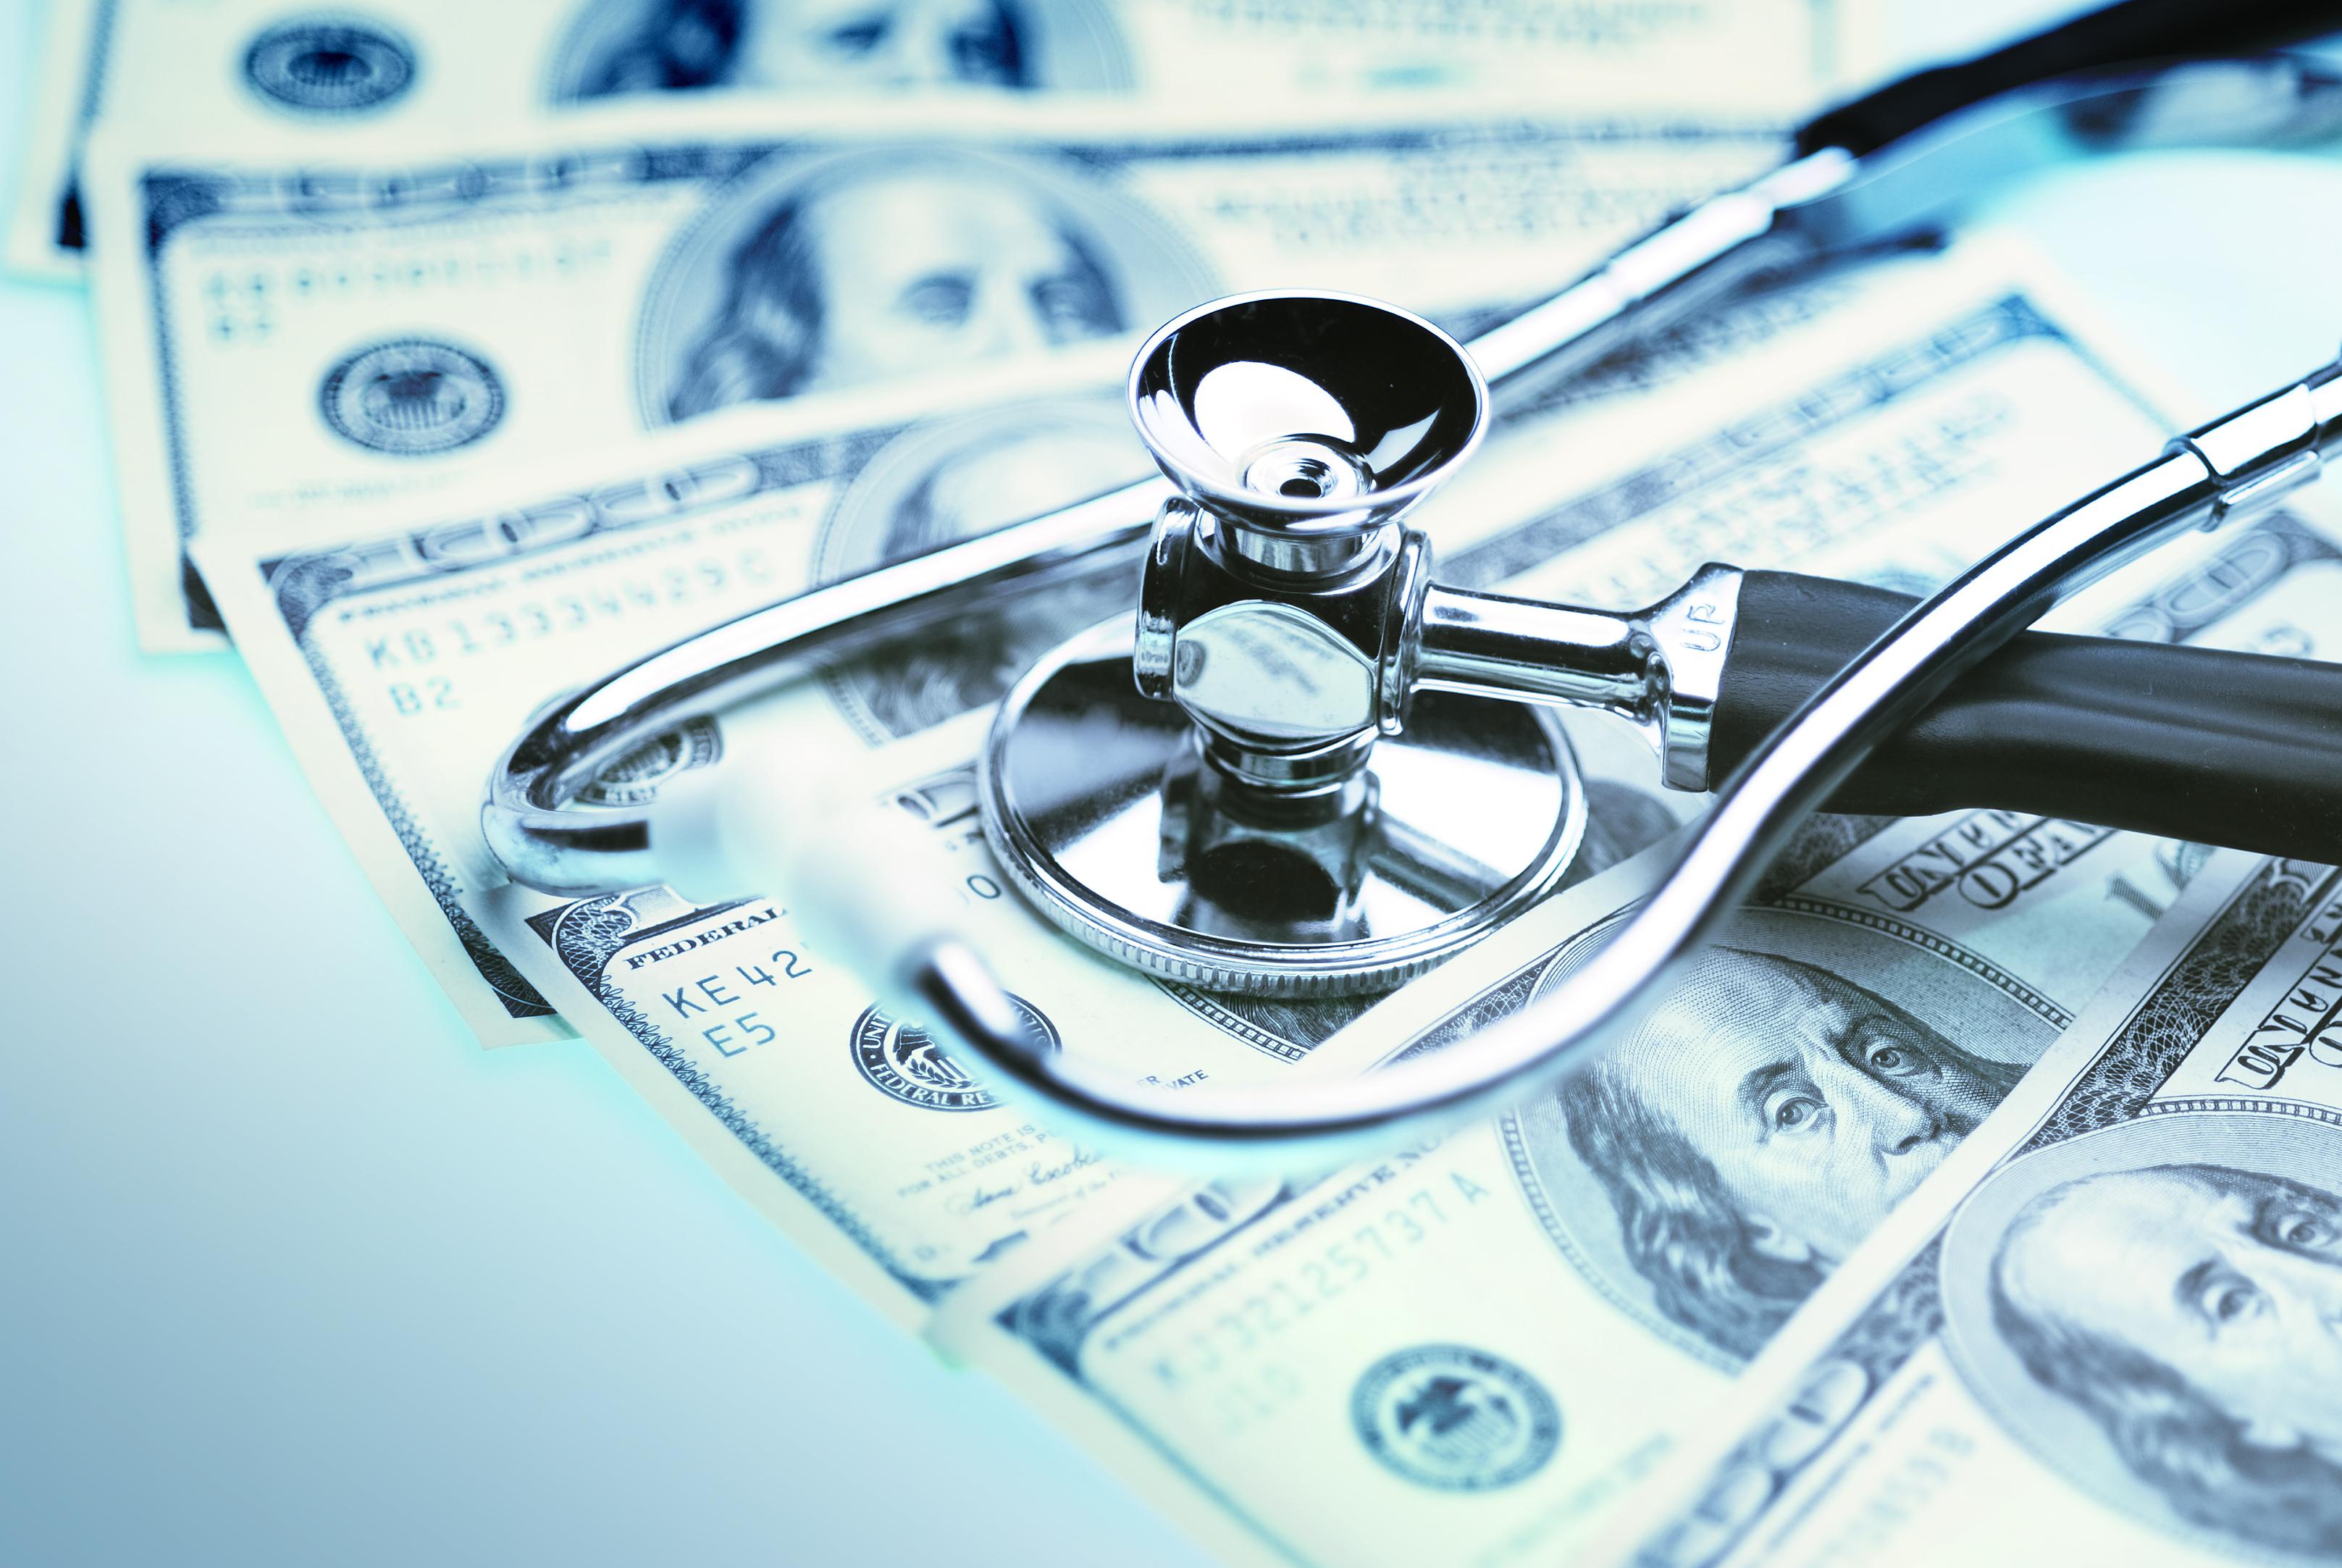 Stethoscope and hundred dollar bills